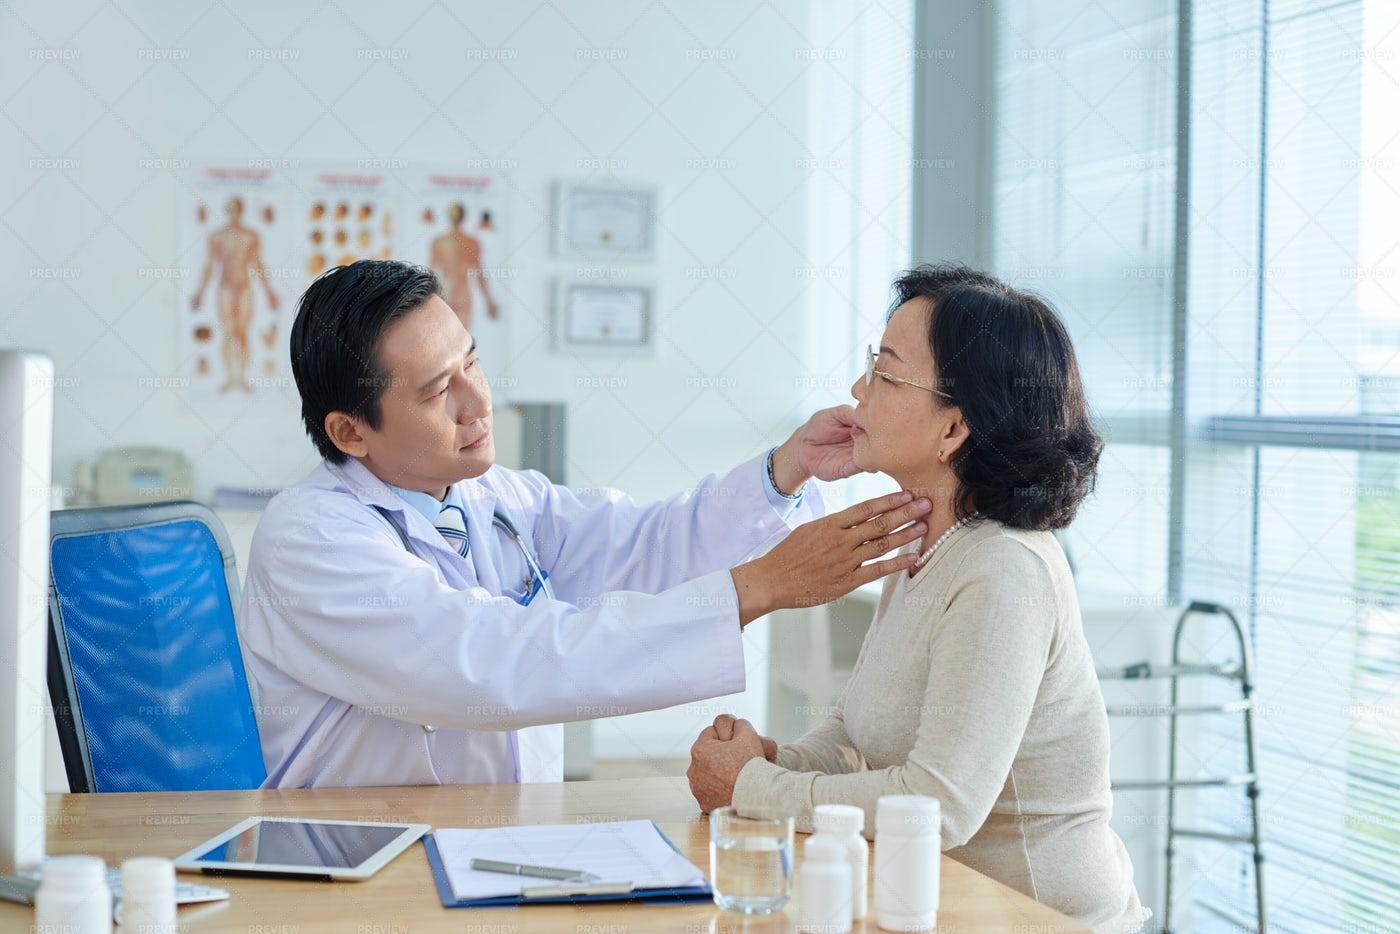 ENT Specialist Examining Patient: Stock Photos